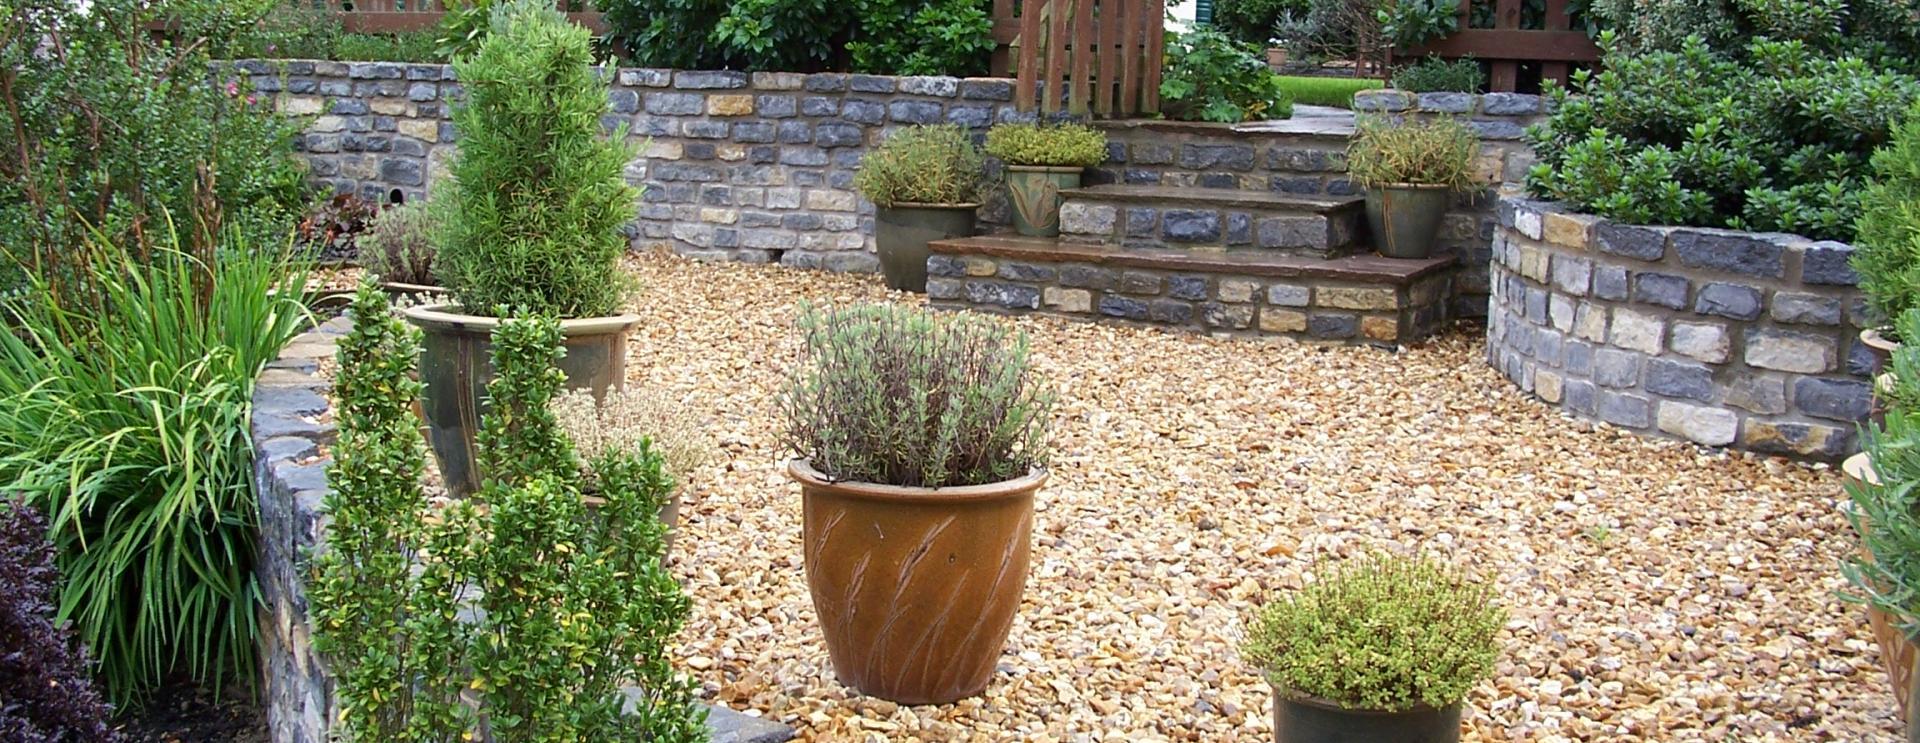 landscapping 4.jpg